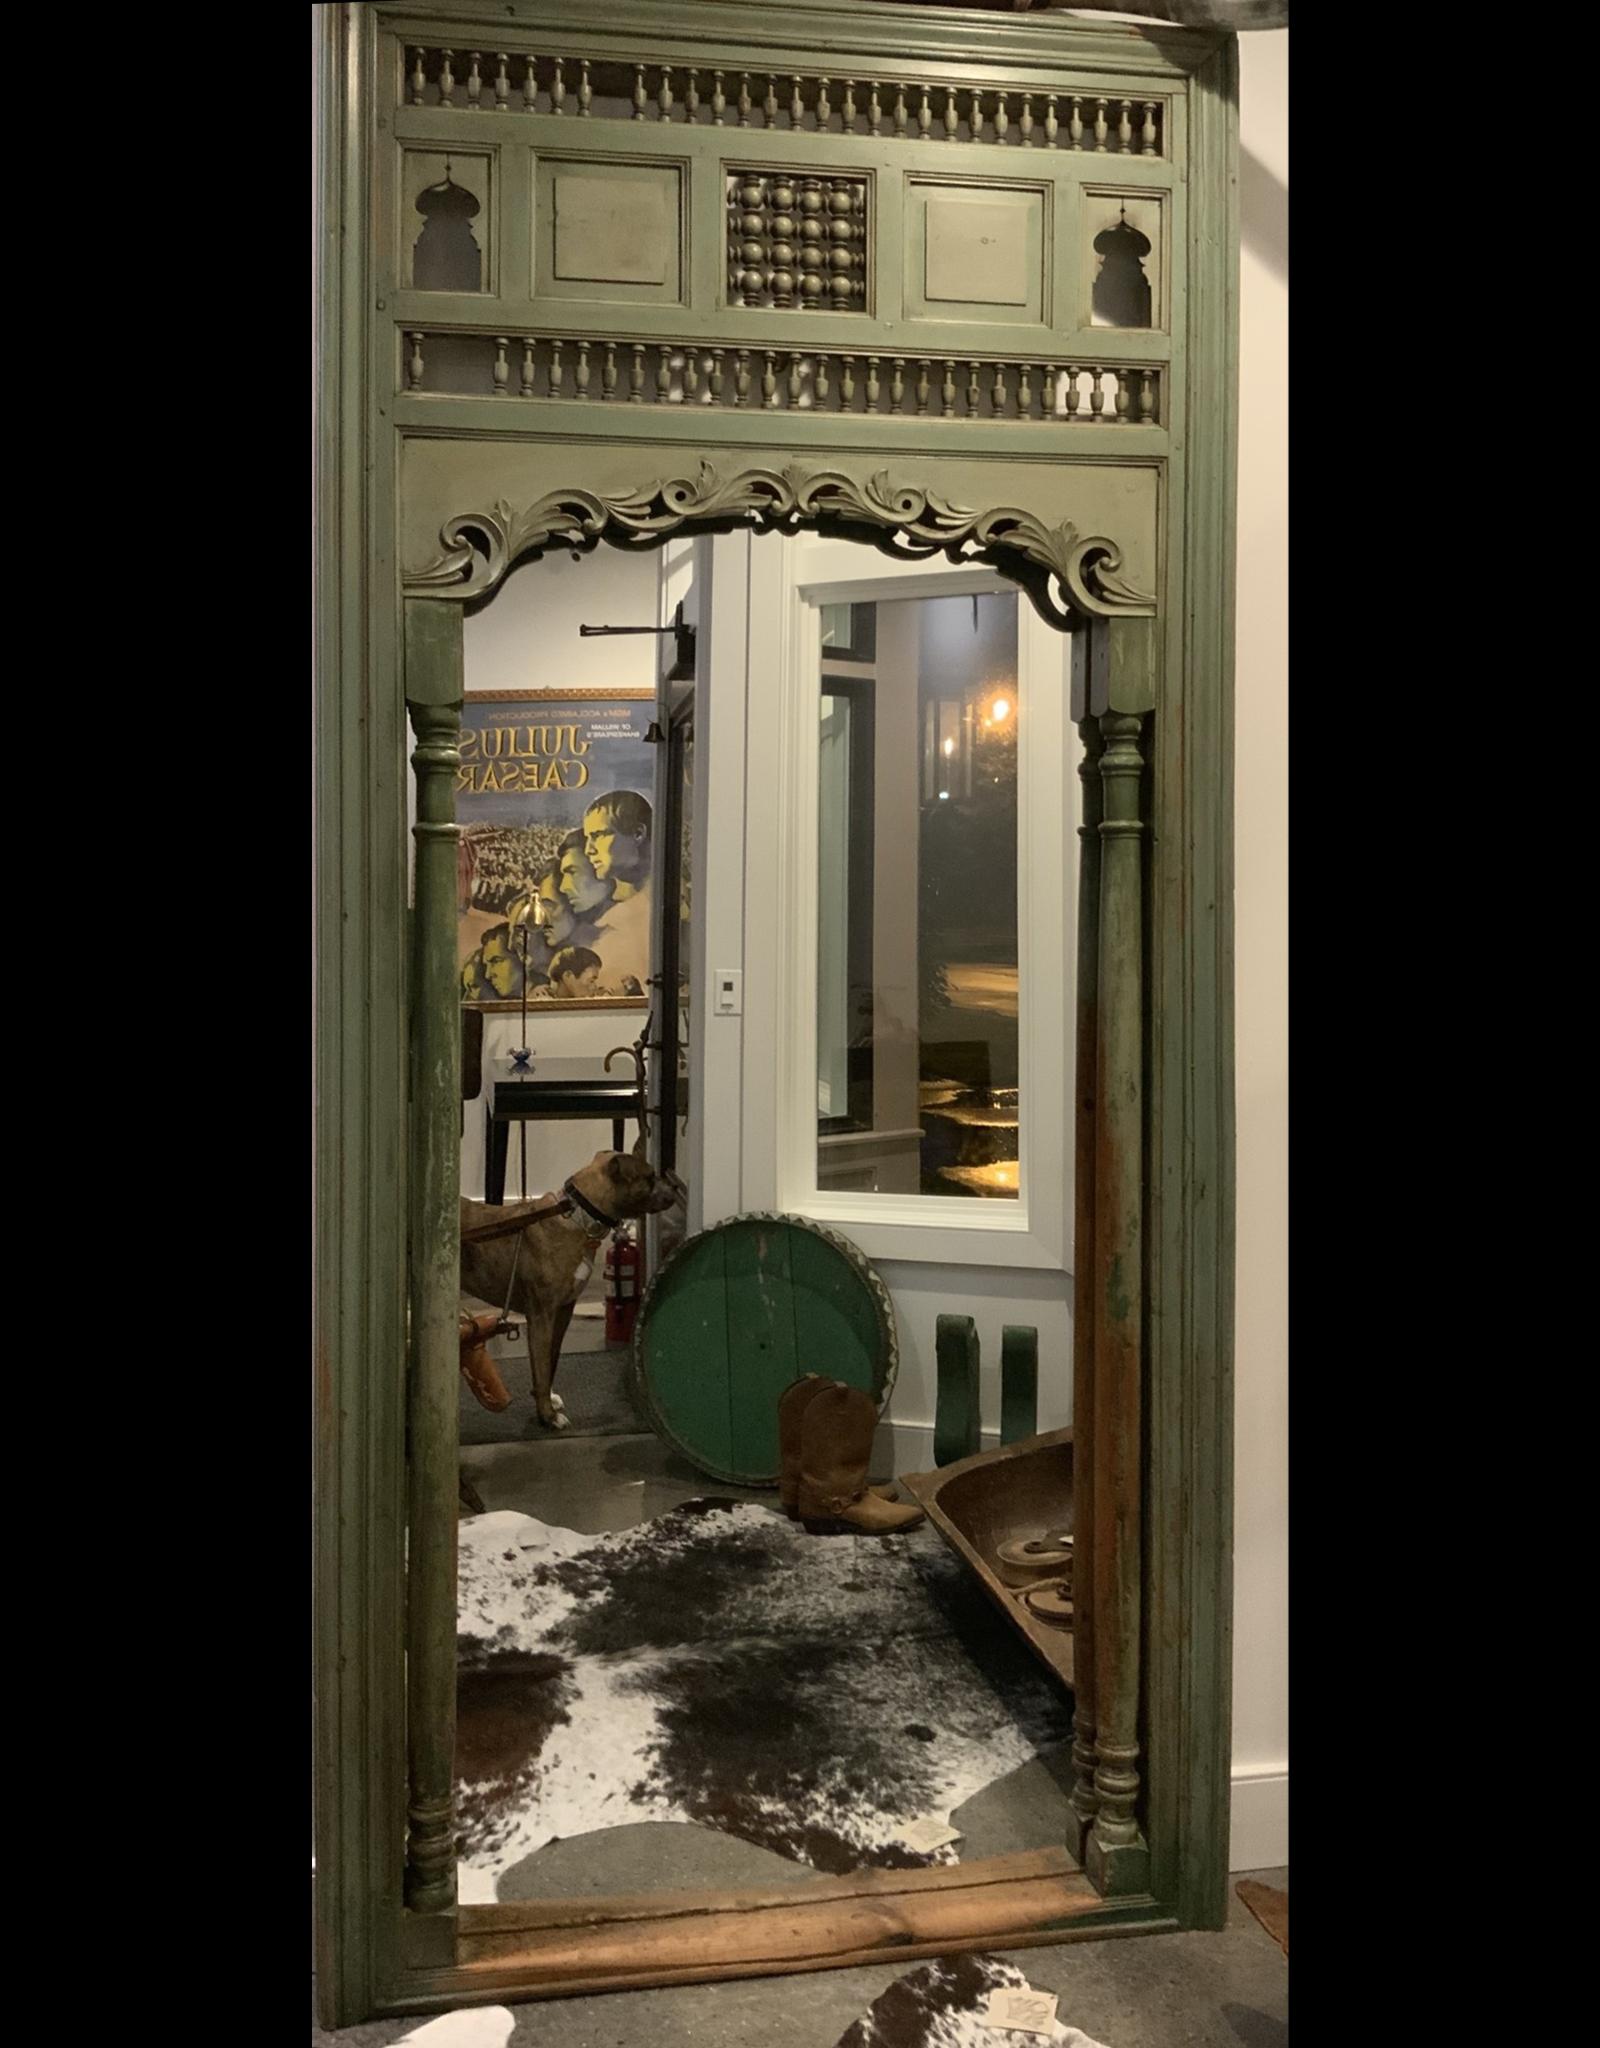 SPV Old door full-length mirror frame